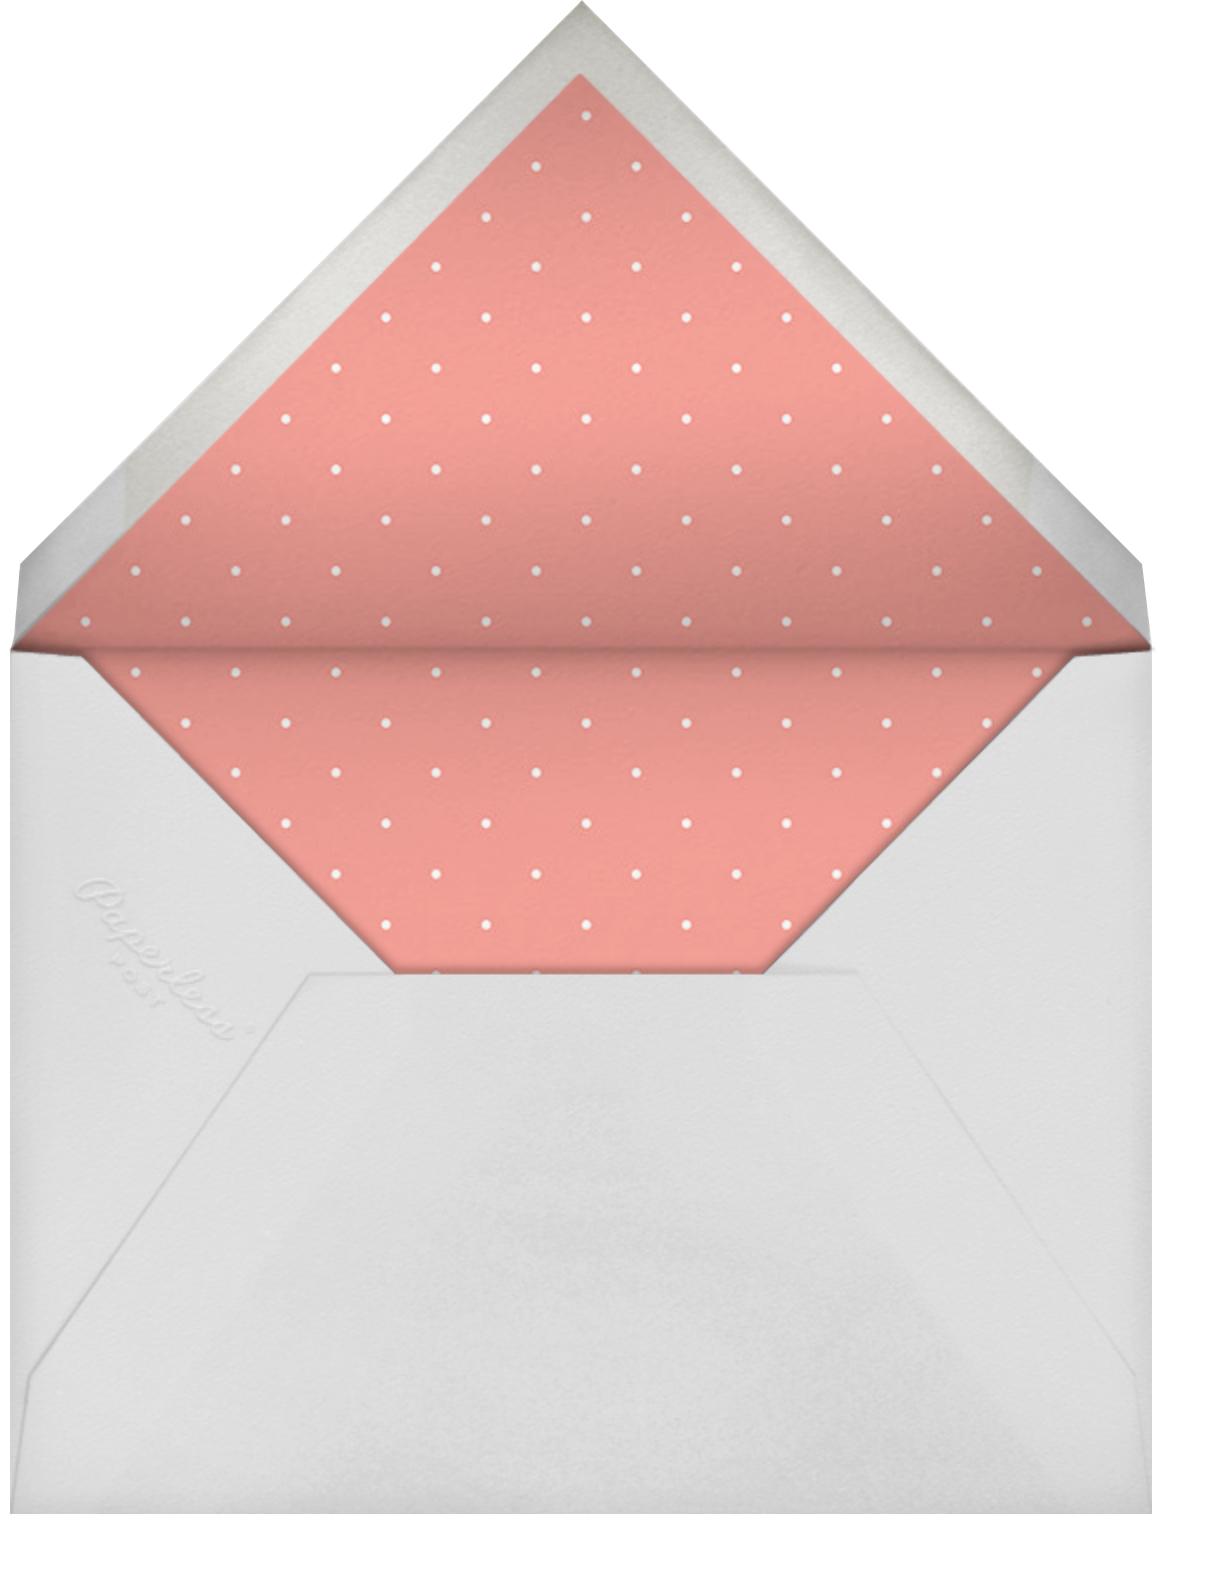 Lollipop - Japanese Mix - Mr. Boddington's Studio - Envelope